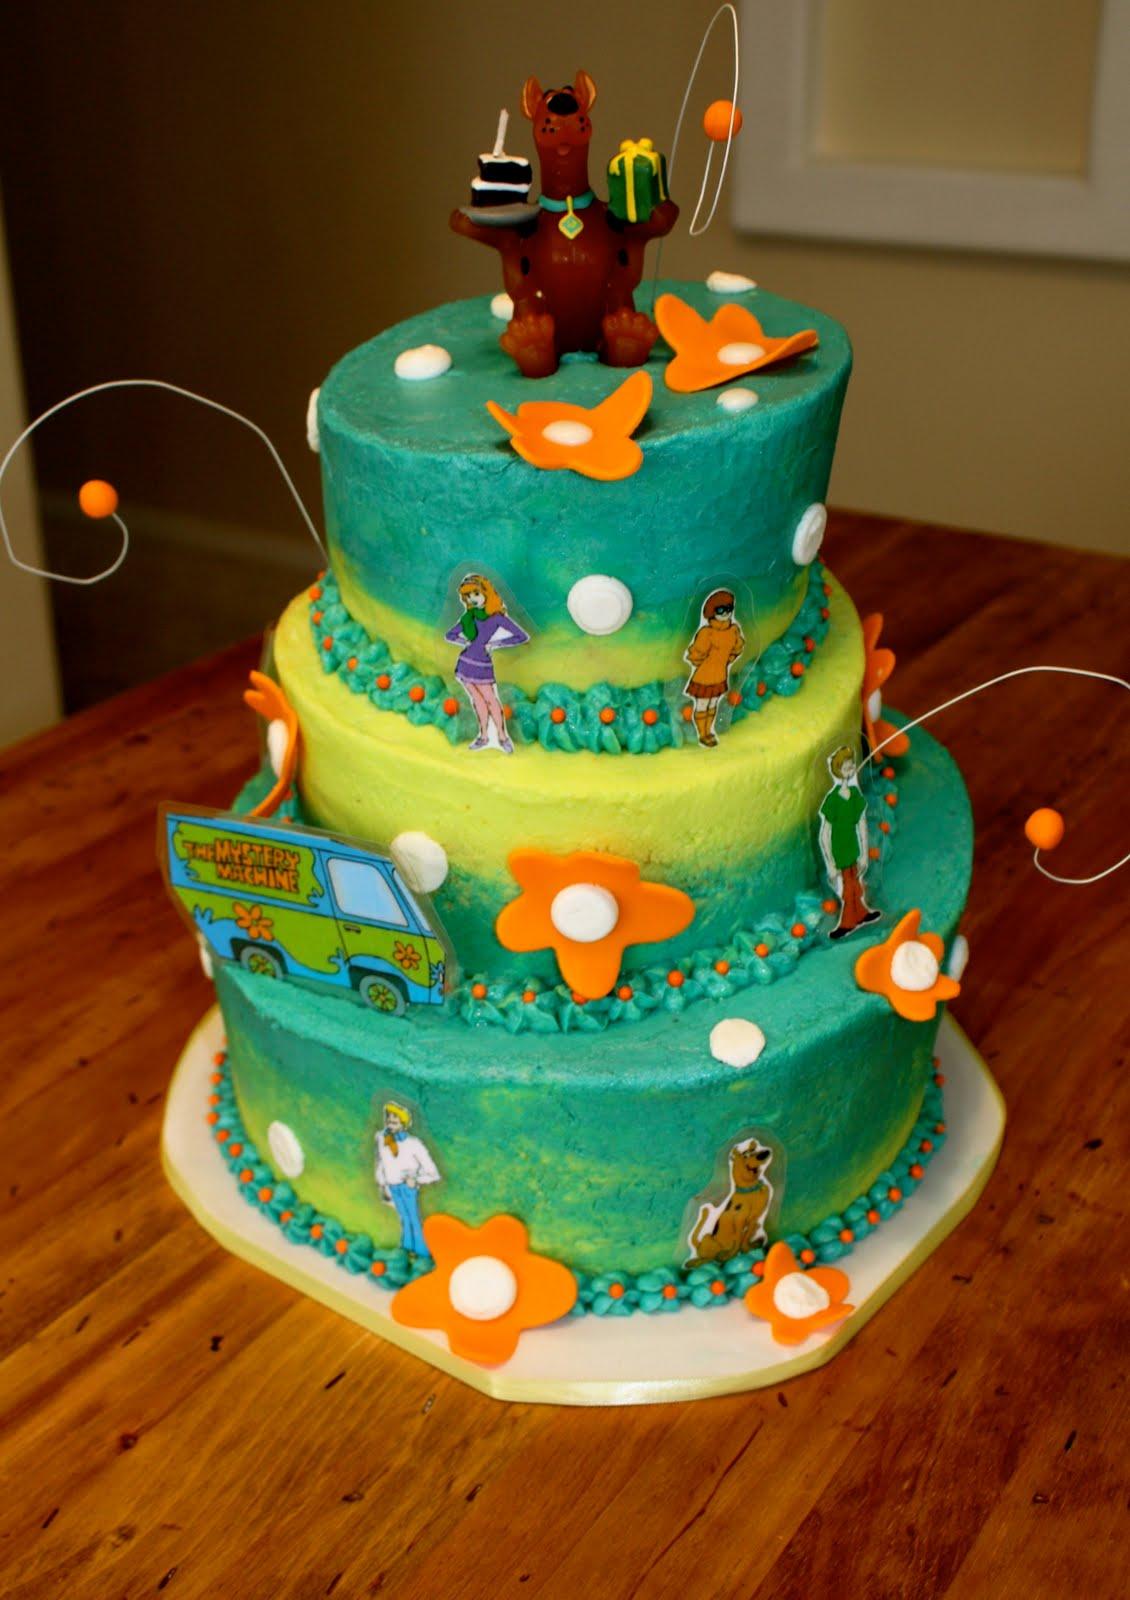 Scoobydoo Lego Cakes Ideas 29519 Scooby Doo Cakes Decorat